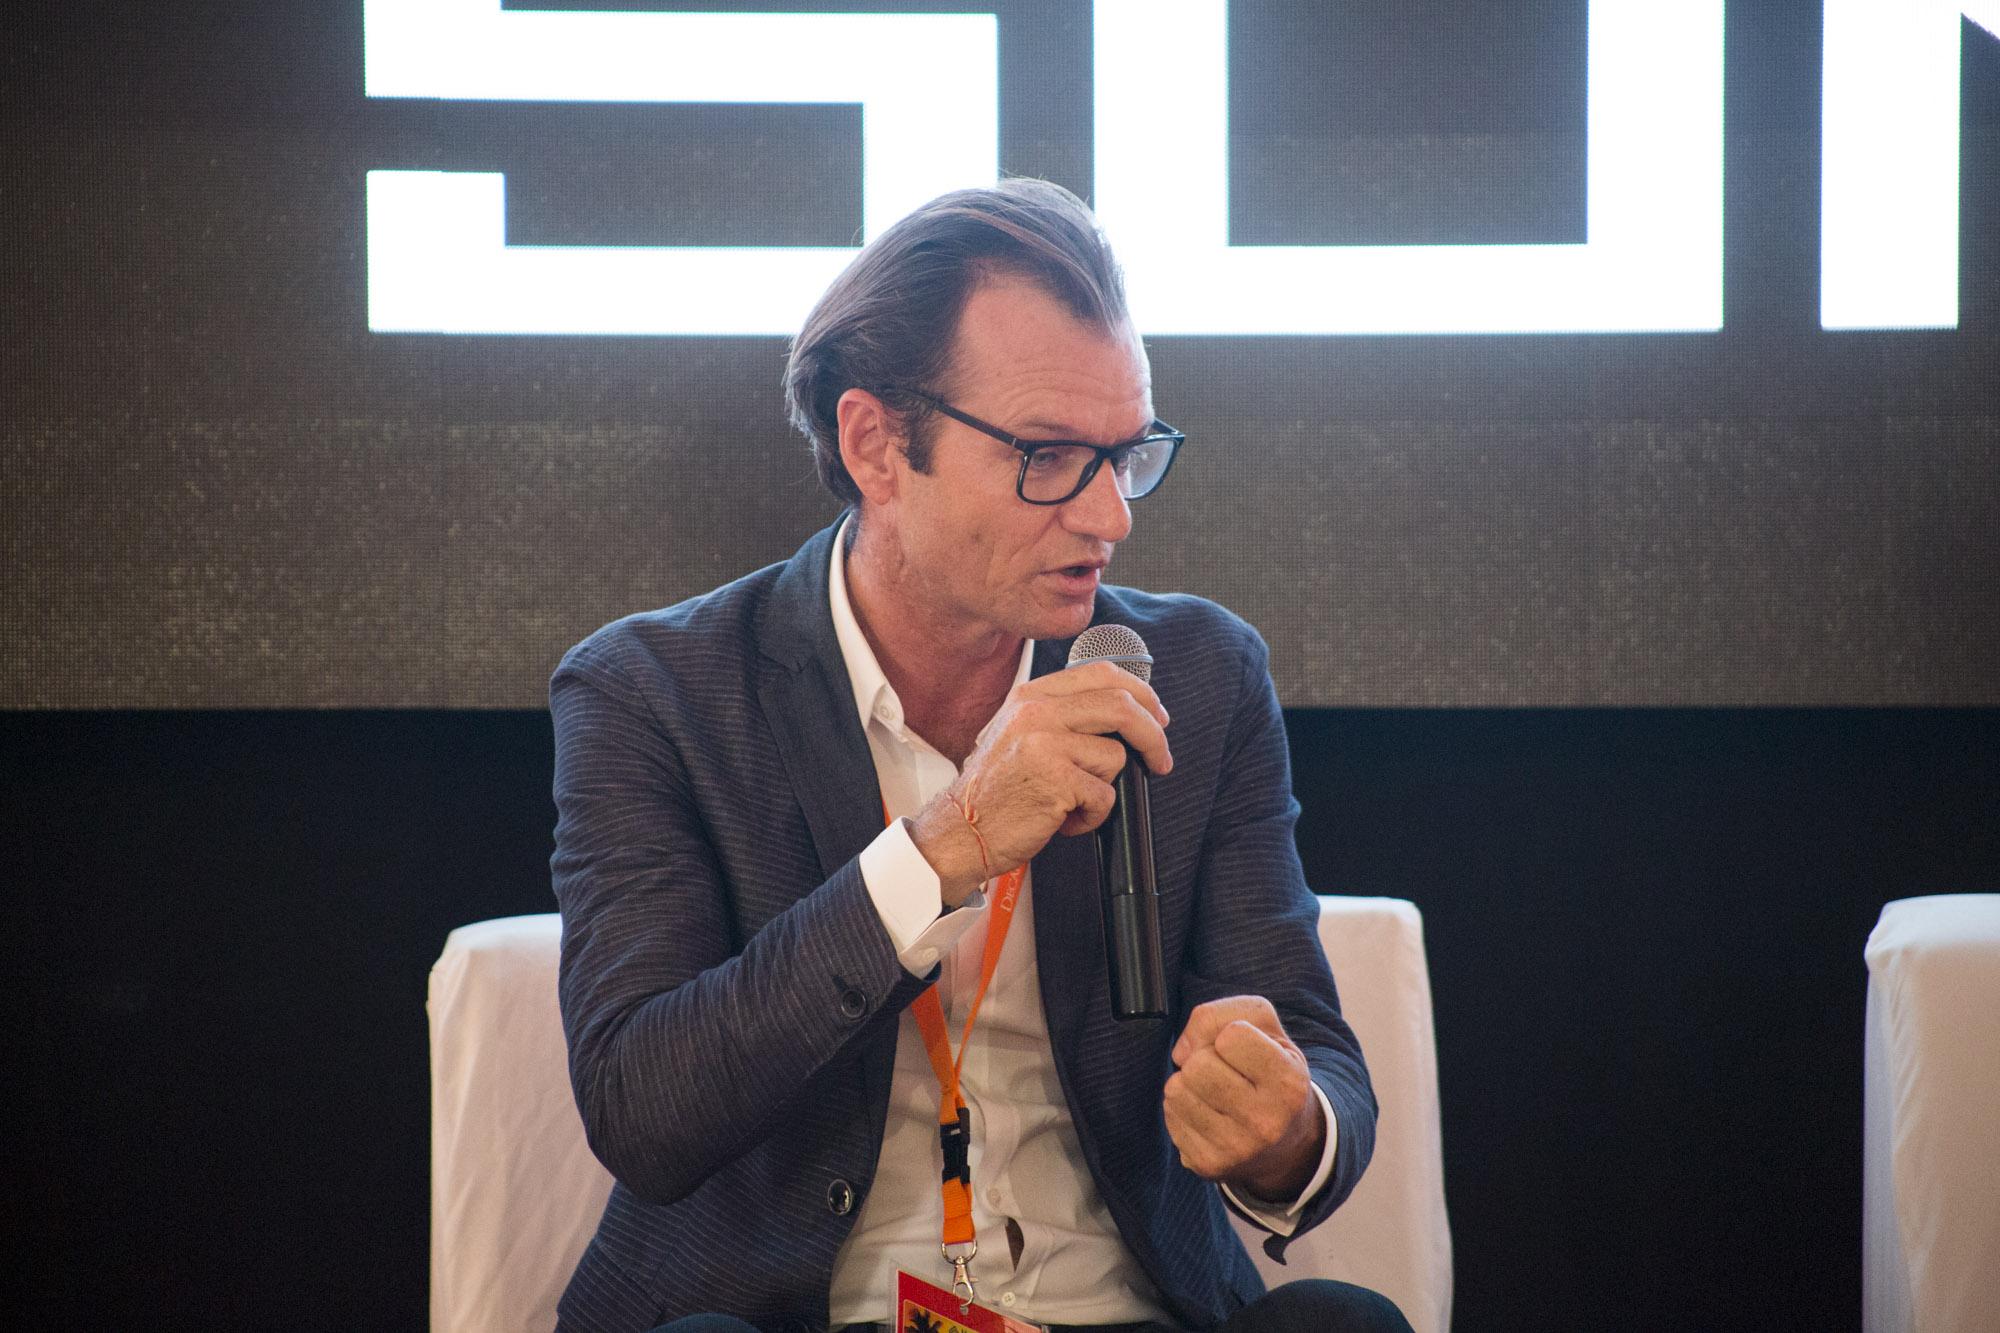 Maarten Boute, président de la Digicel. Photo: Loop Haiti